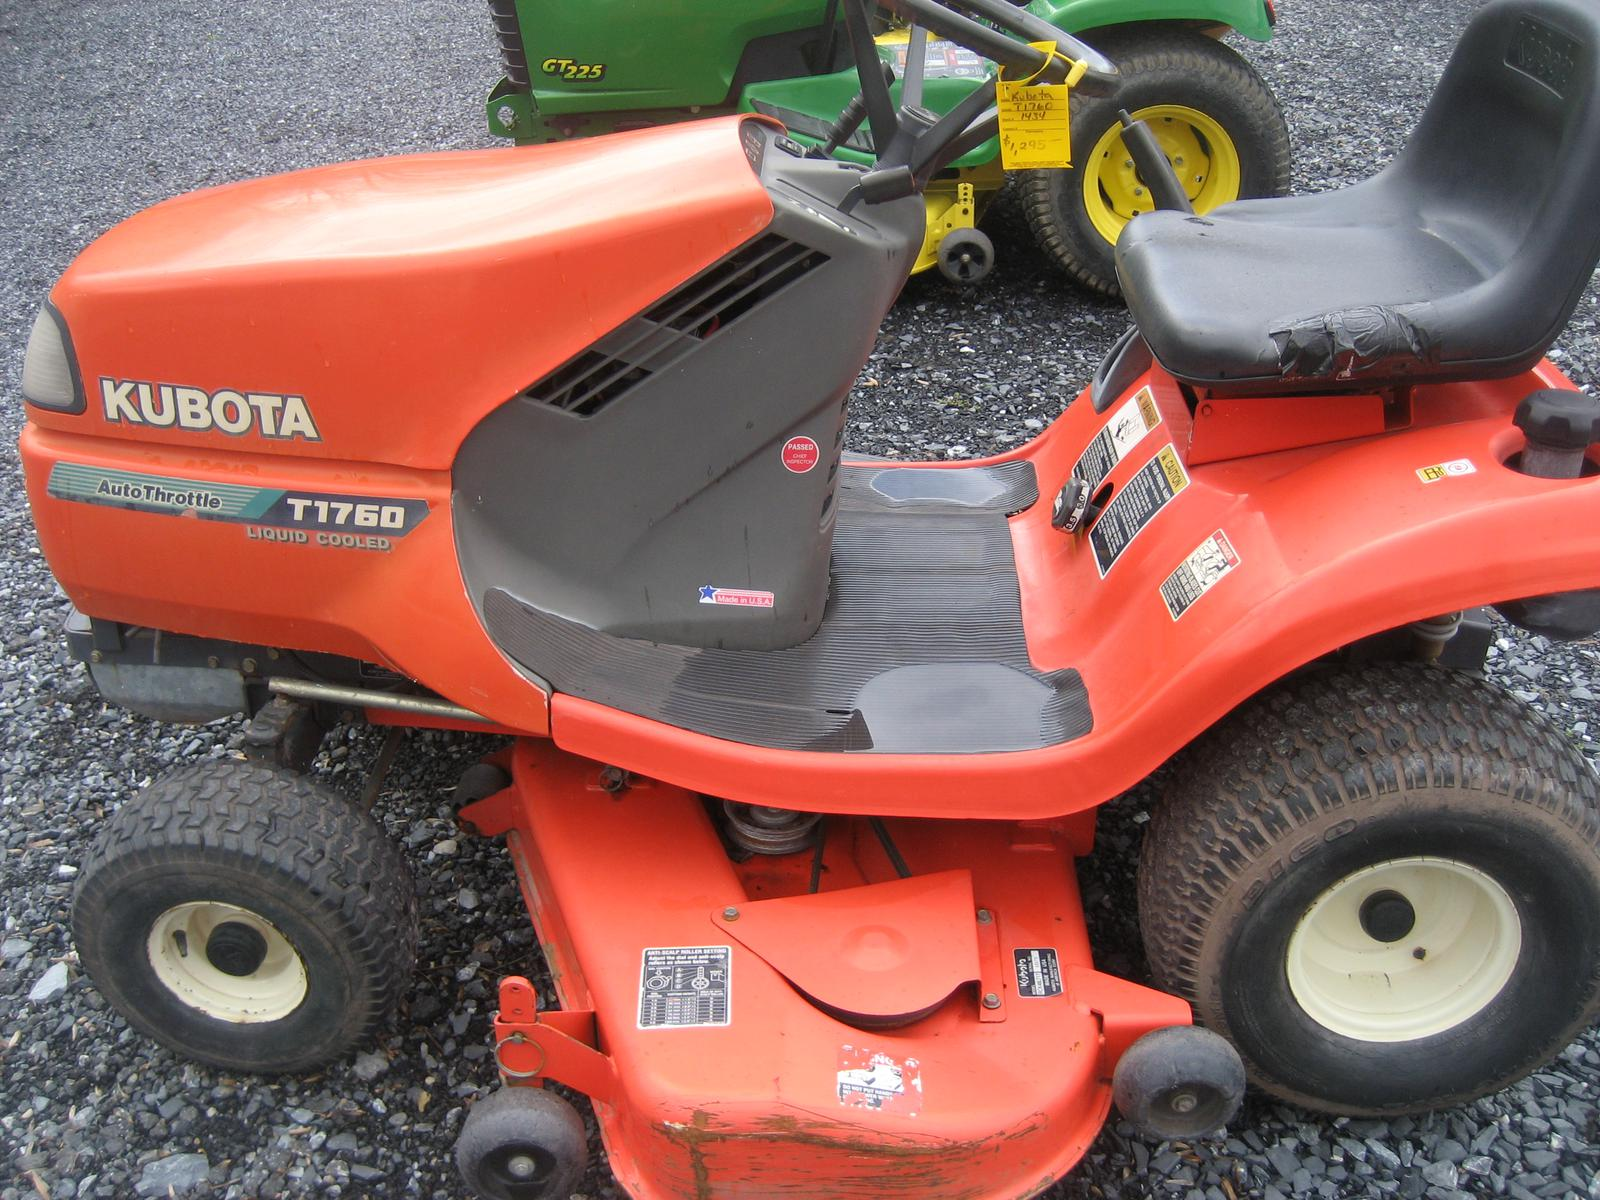 hight resolution of kubota t1760 mower manual wiring diagram u2022 toro mower deck belt diagram kubota t1760 parts